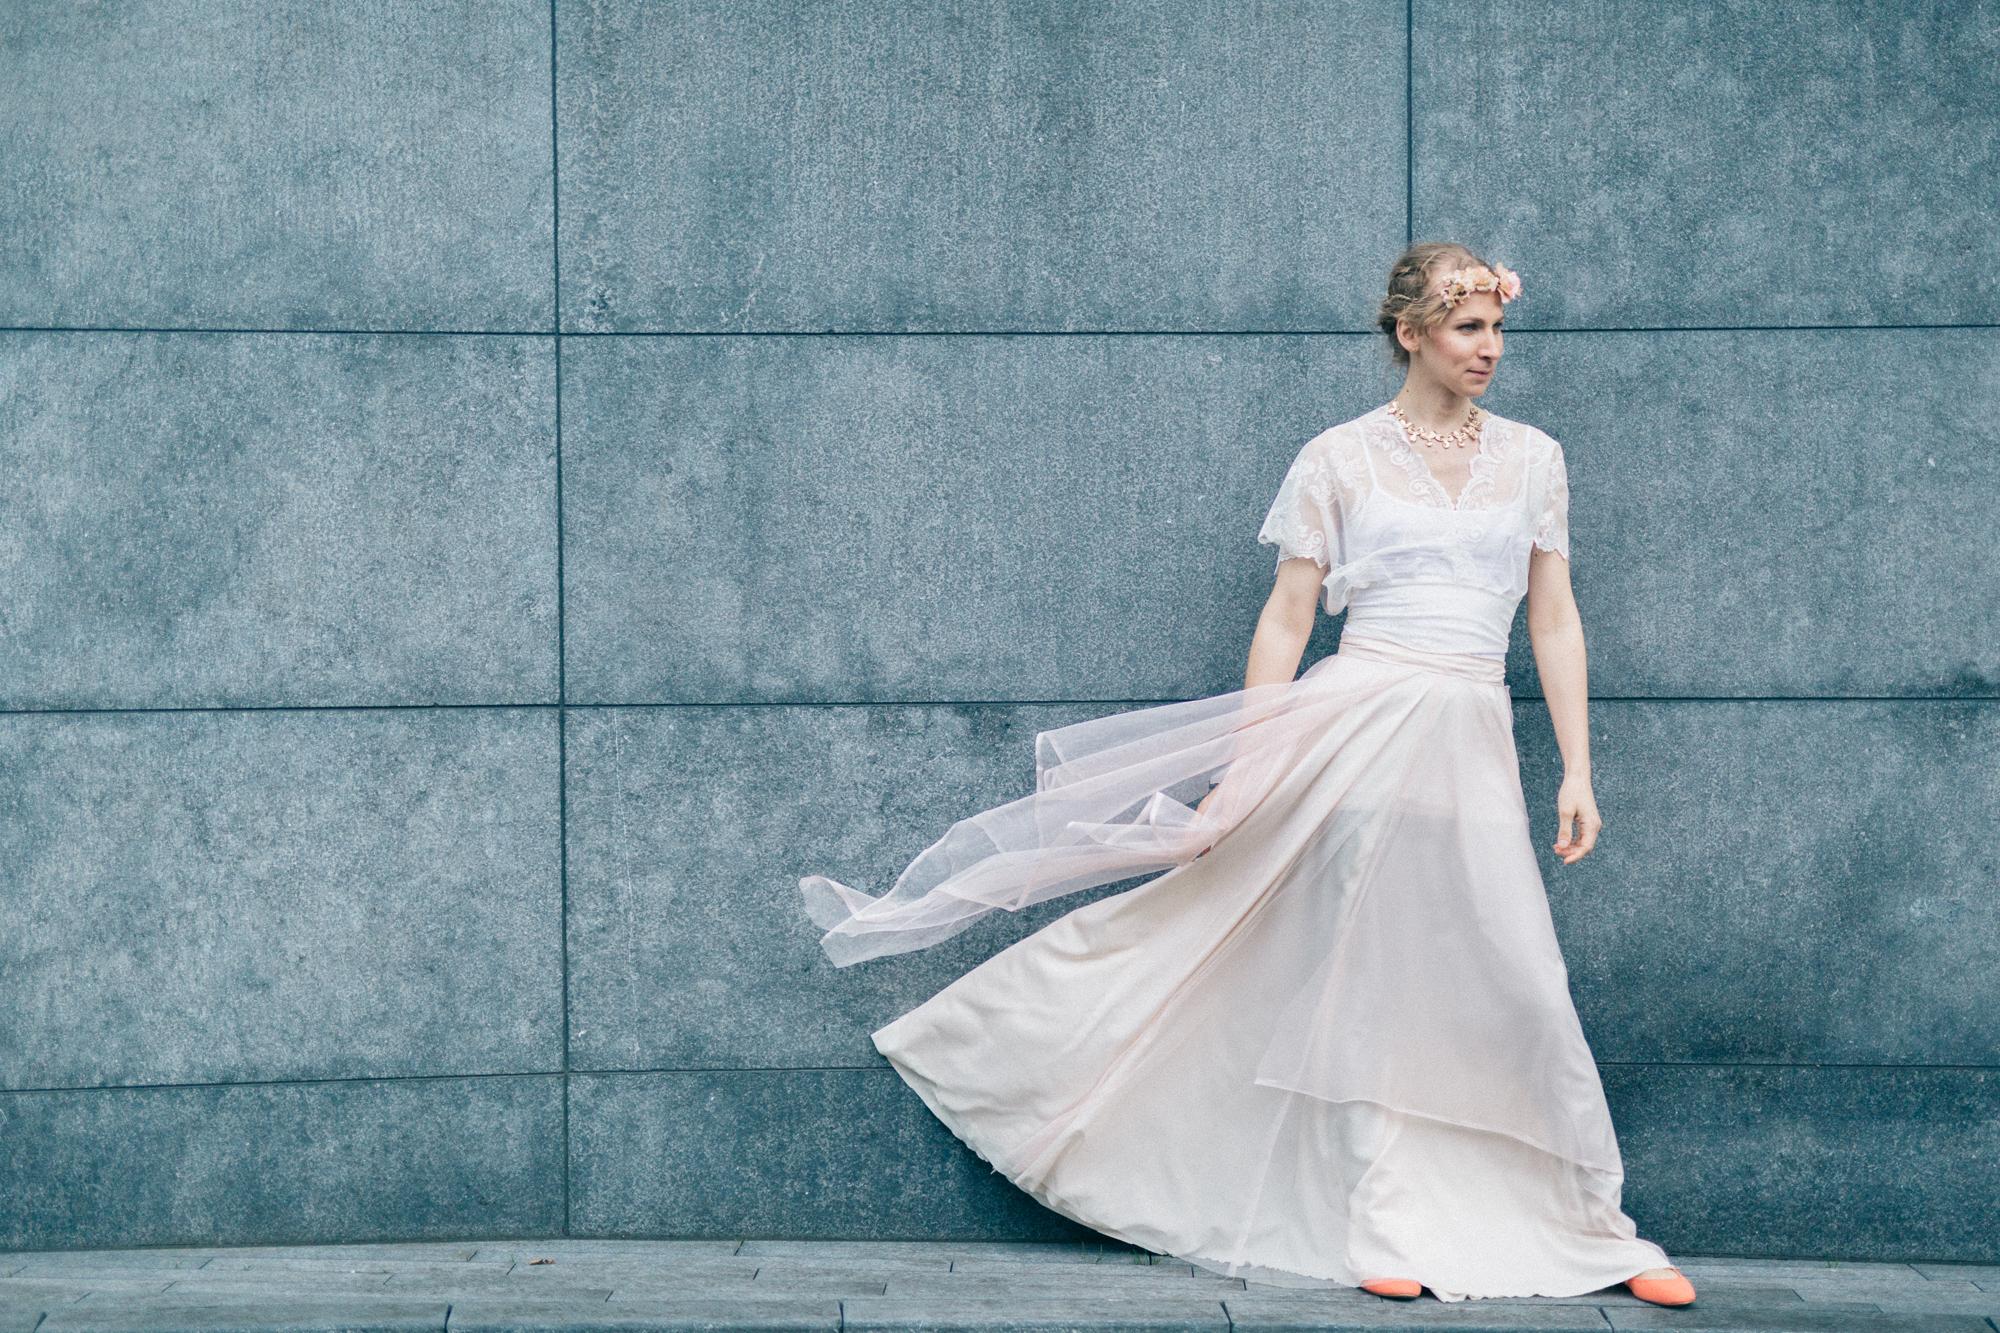 weddingphotographer_lindarehlin_preweddingphoto_london_SensibleM-43.jpg